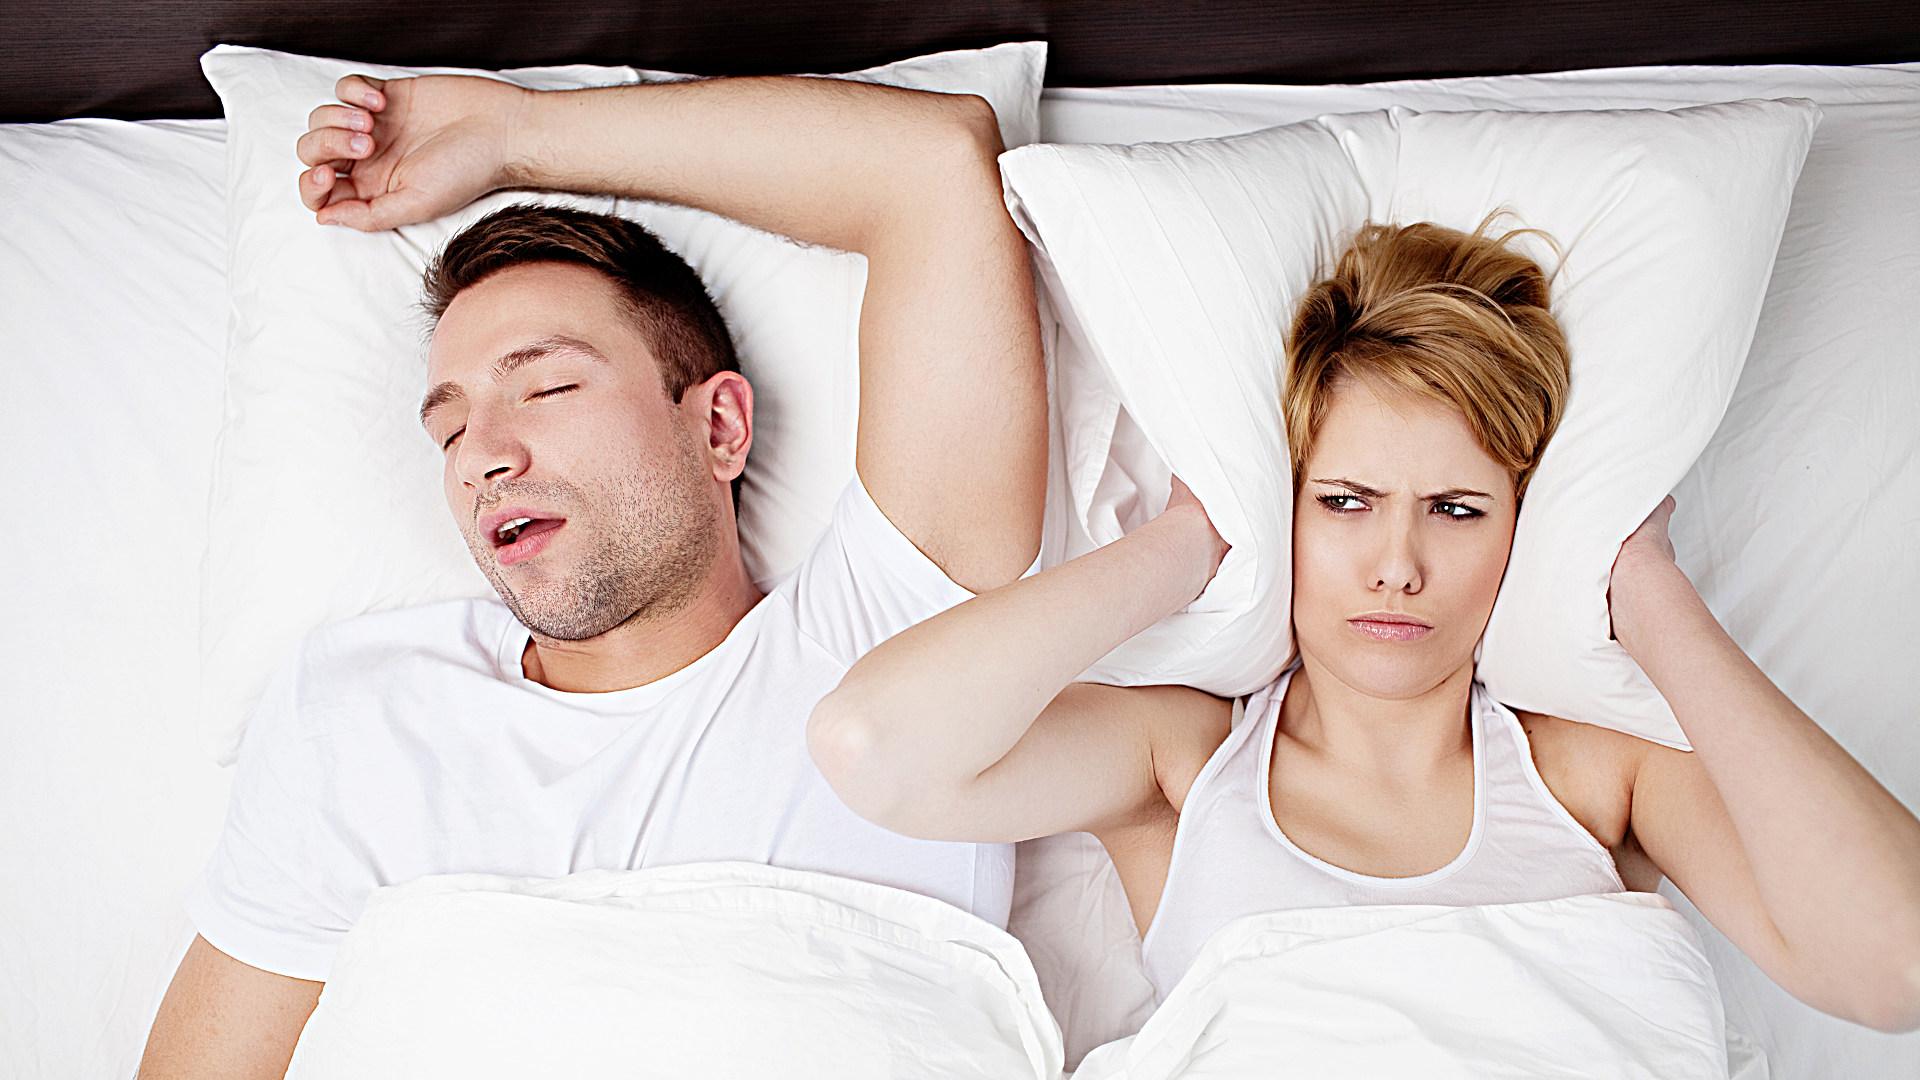 Особенности возникновения и лечения мужского храпа